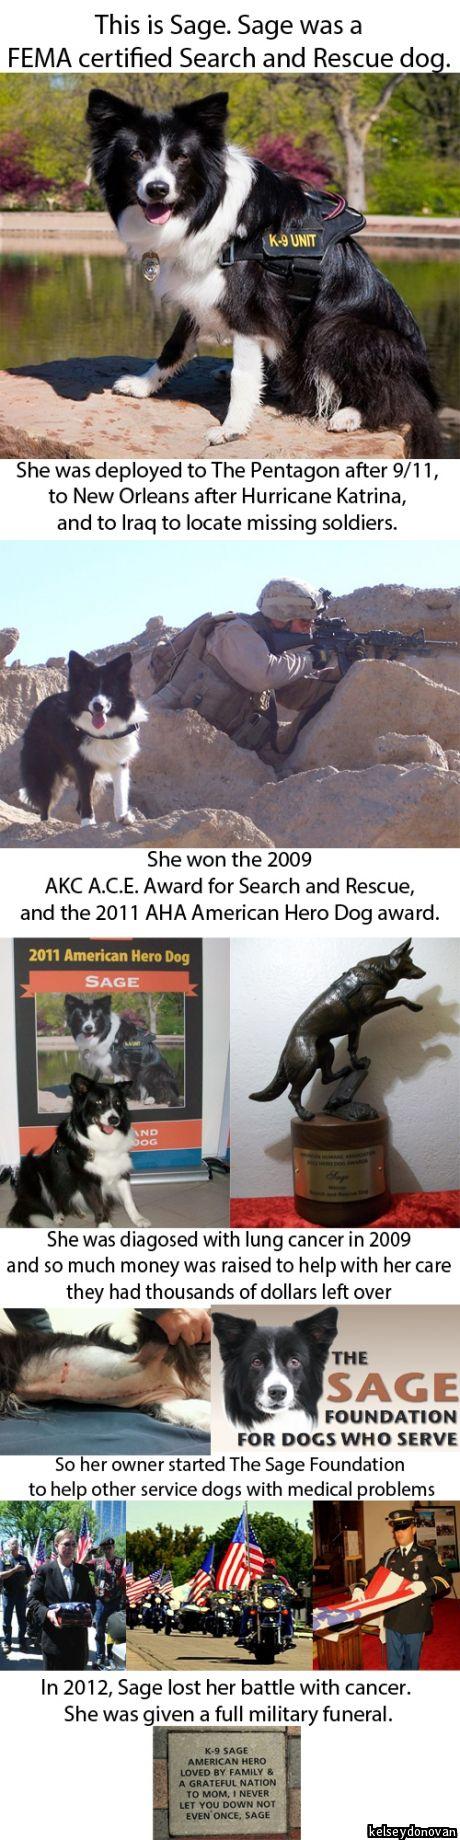 Speaking of amazing dogs...